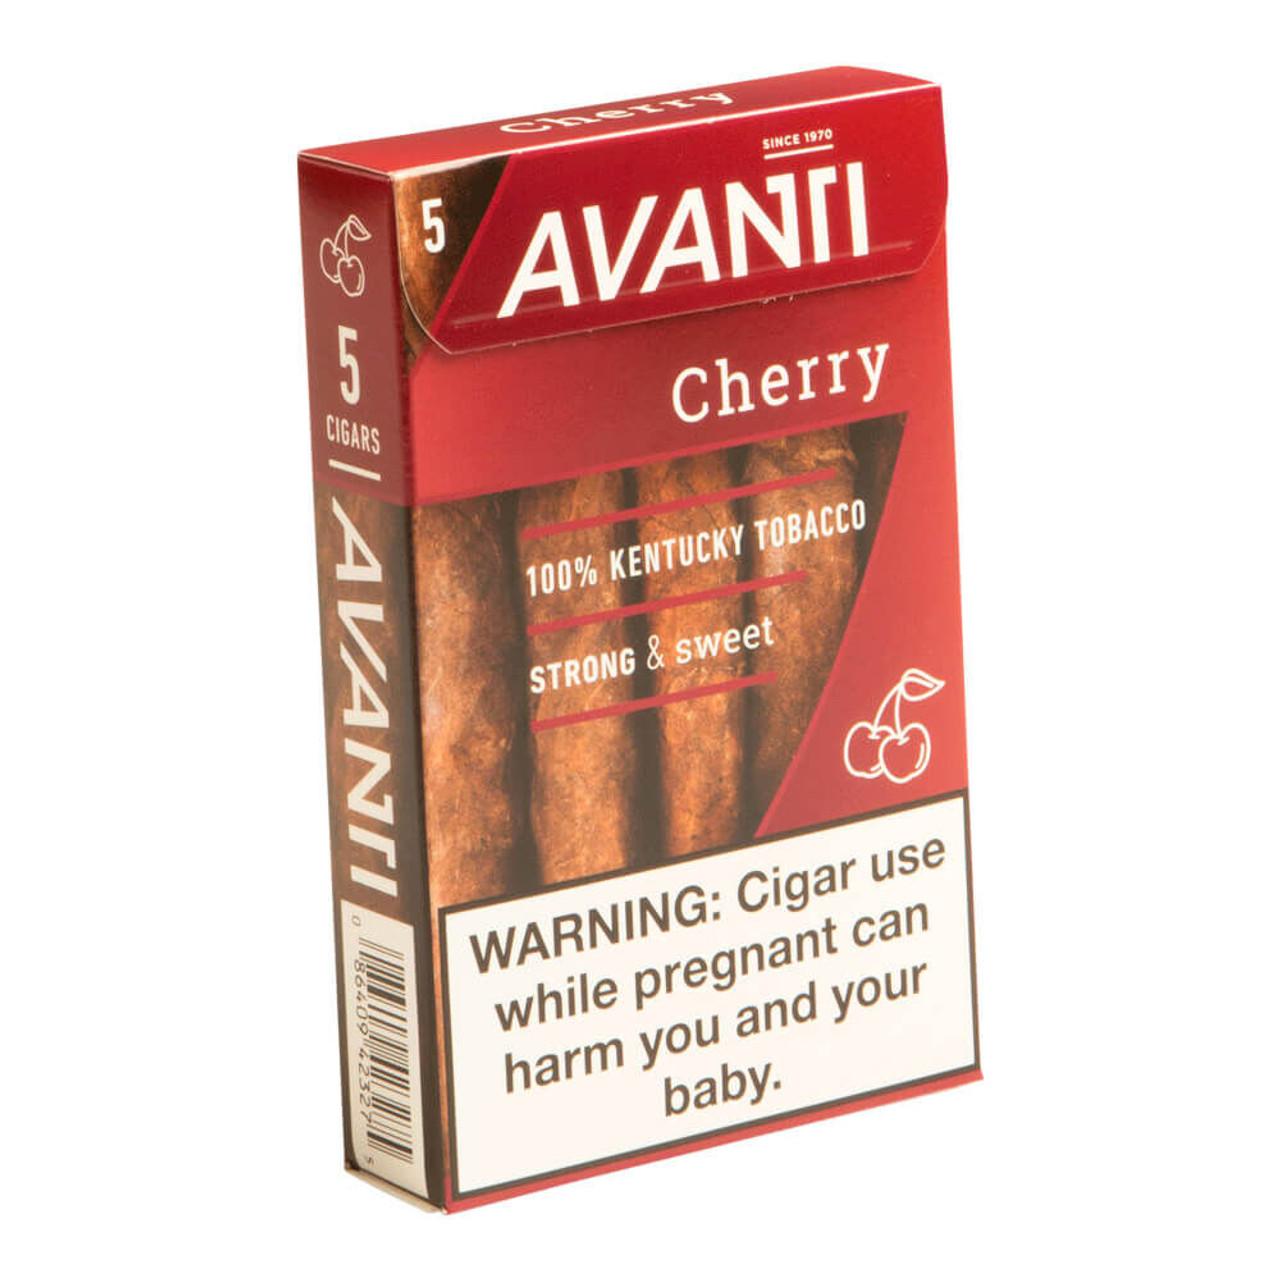 Avanti Cherry Cigars - 4.5 x 34 (10 Packs of 5 (50 total)